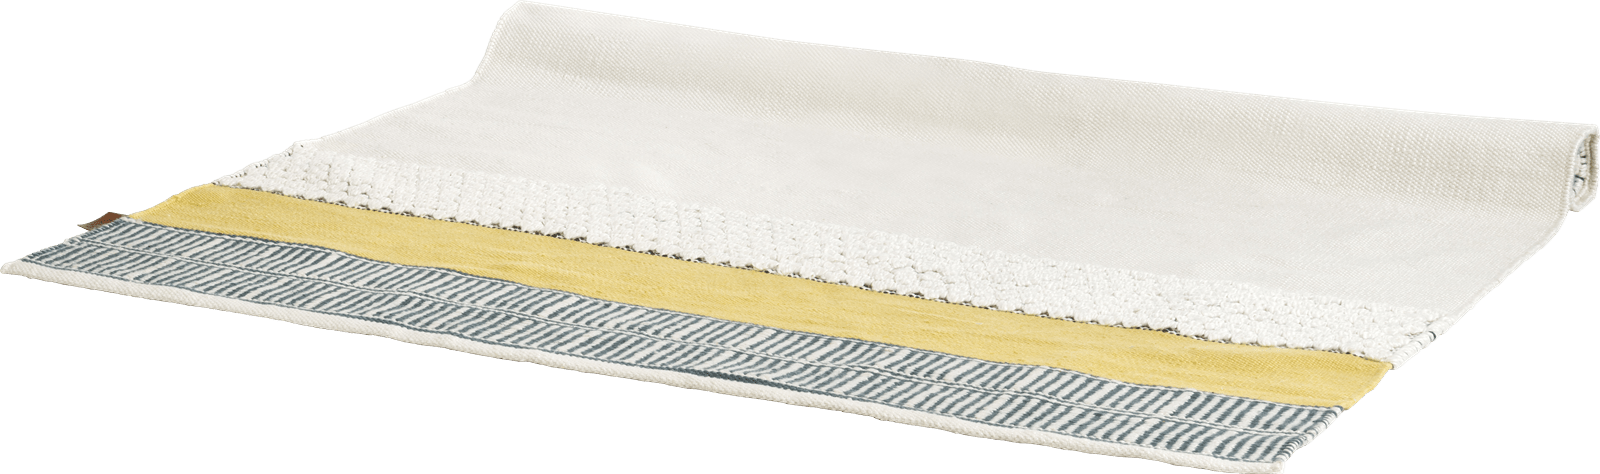 Coco Maison - karpet lis - 160 x 230 cm - outdoor - 100% polyester